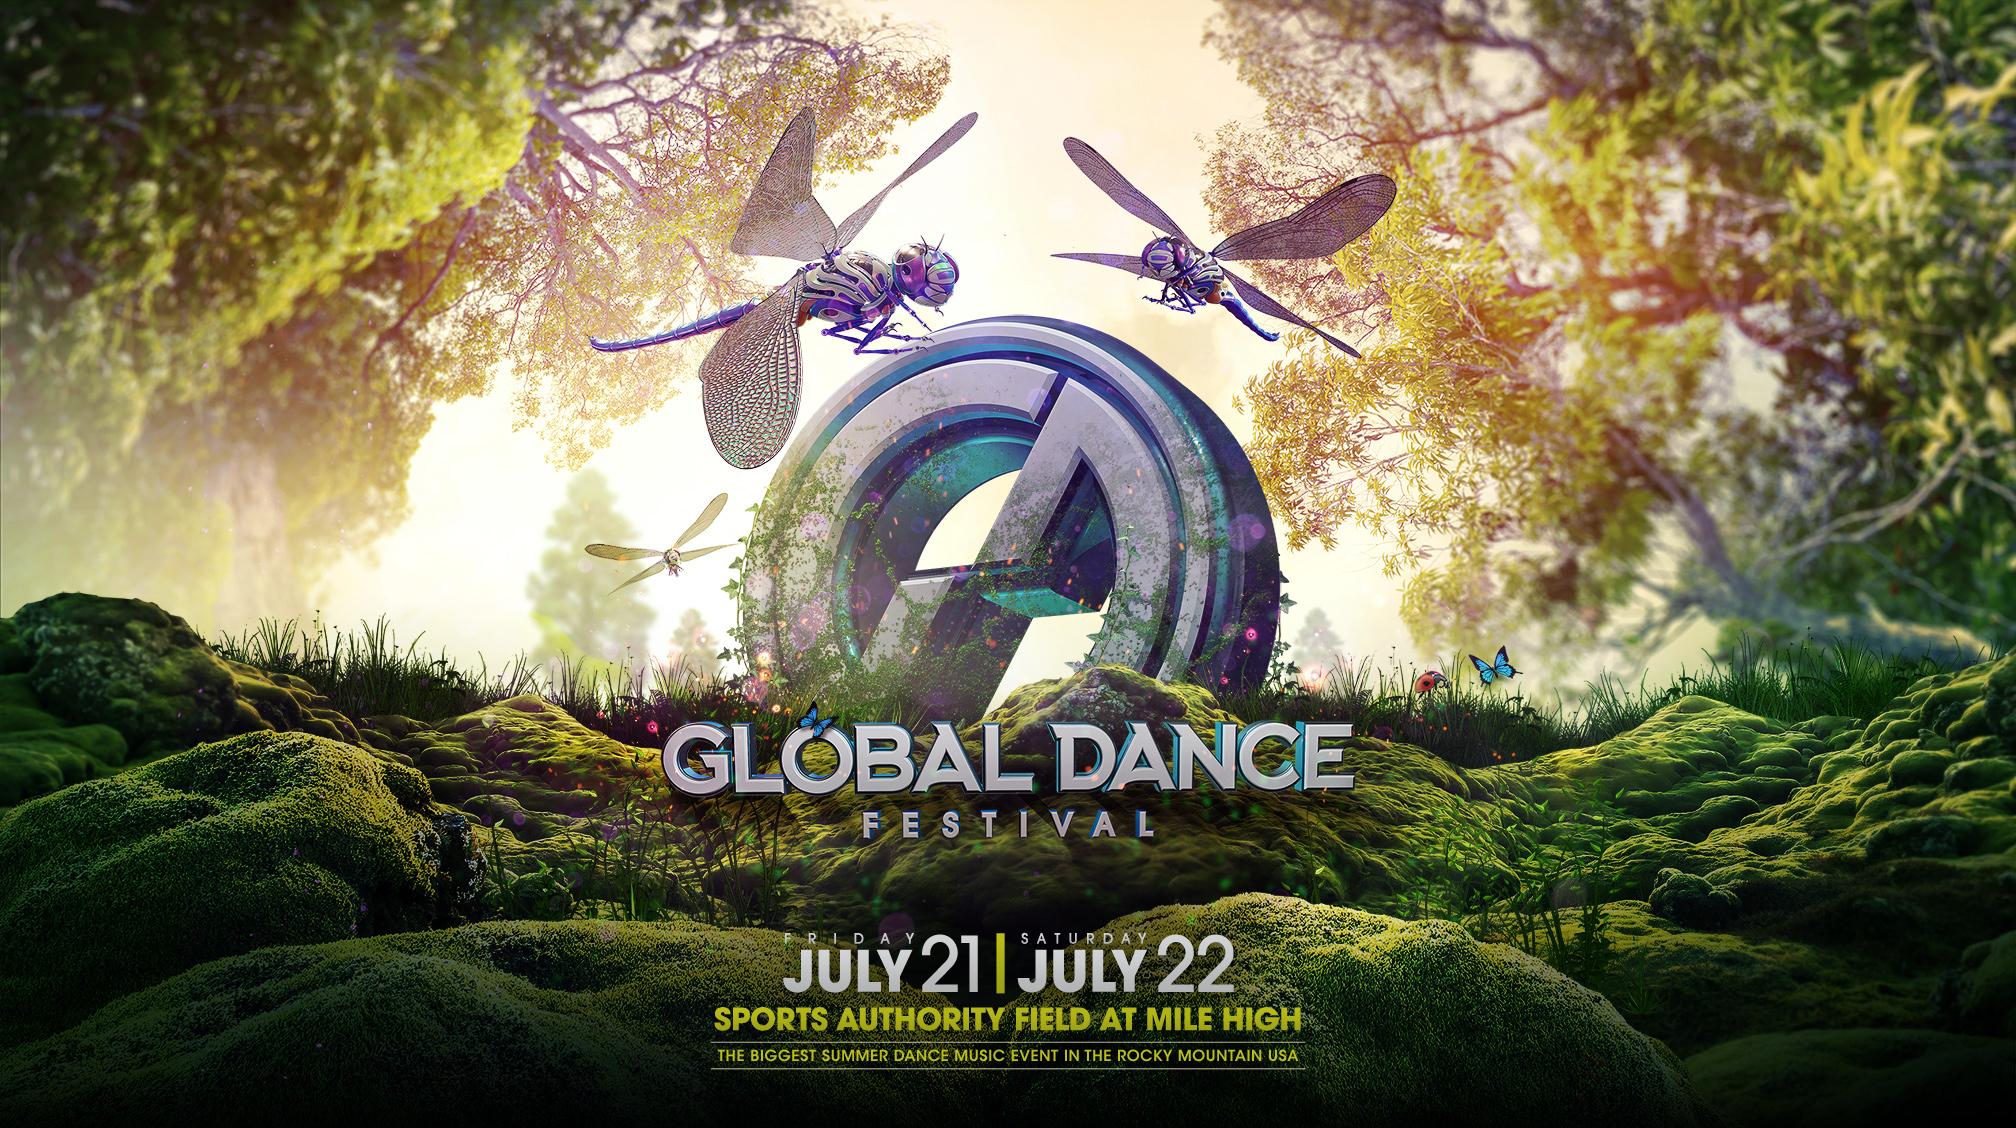 Global Dance Festival Announces 2017 Initial Lineup